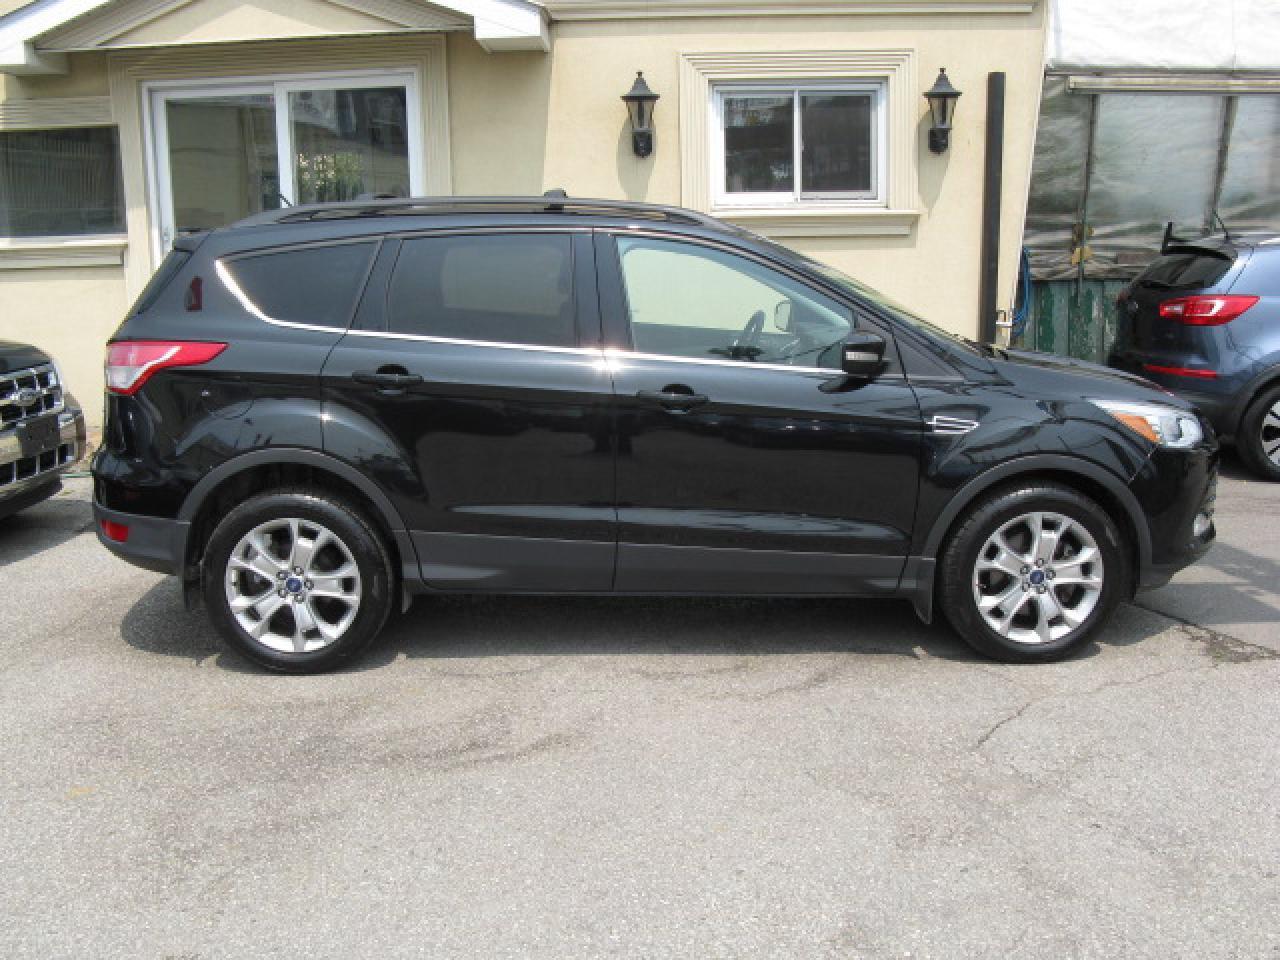 2013 Ford Escape SEL 4WD 2.0L LEATHER BLUETOOTH